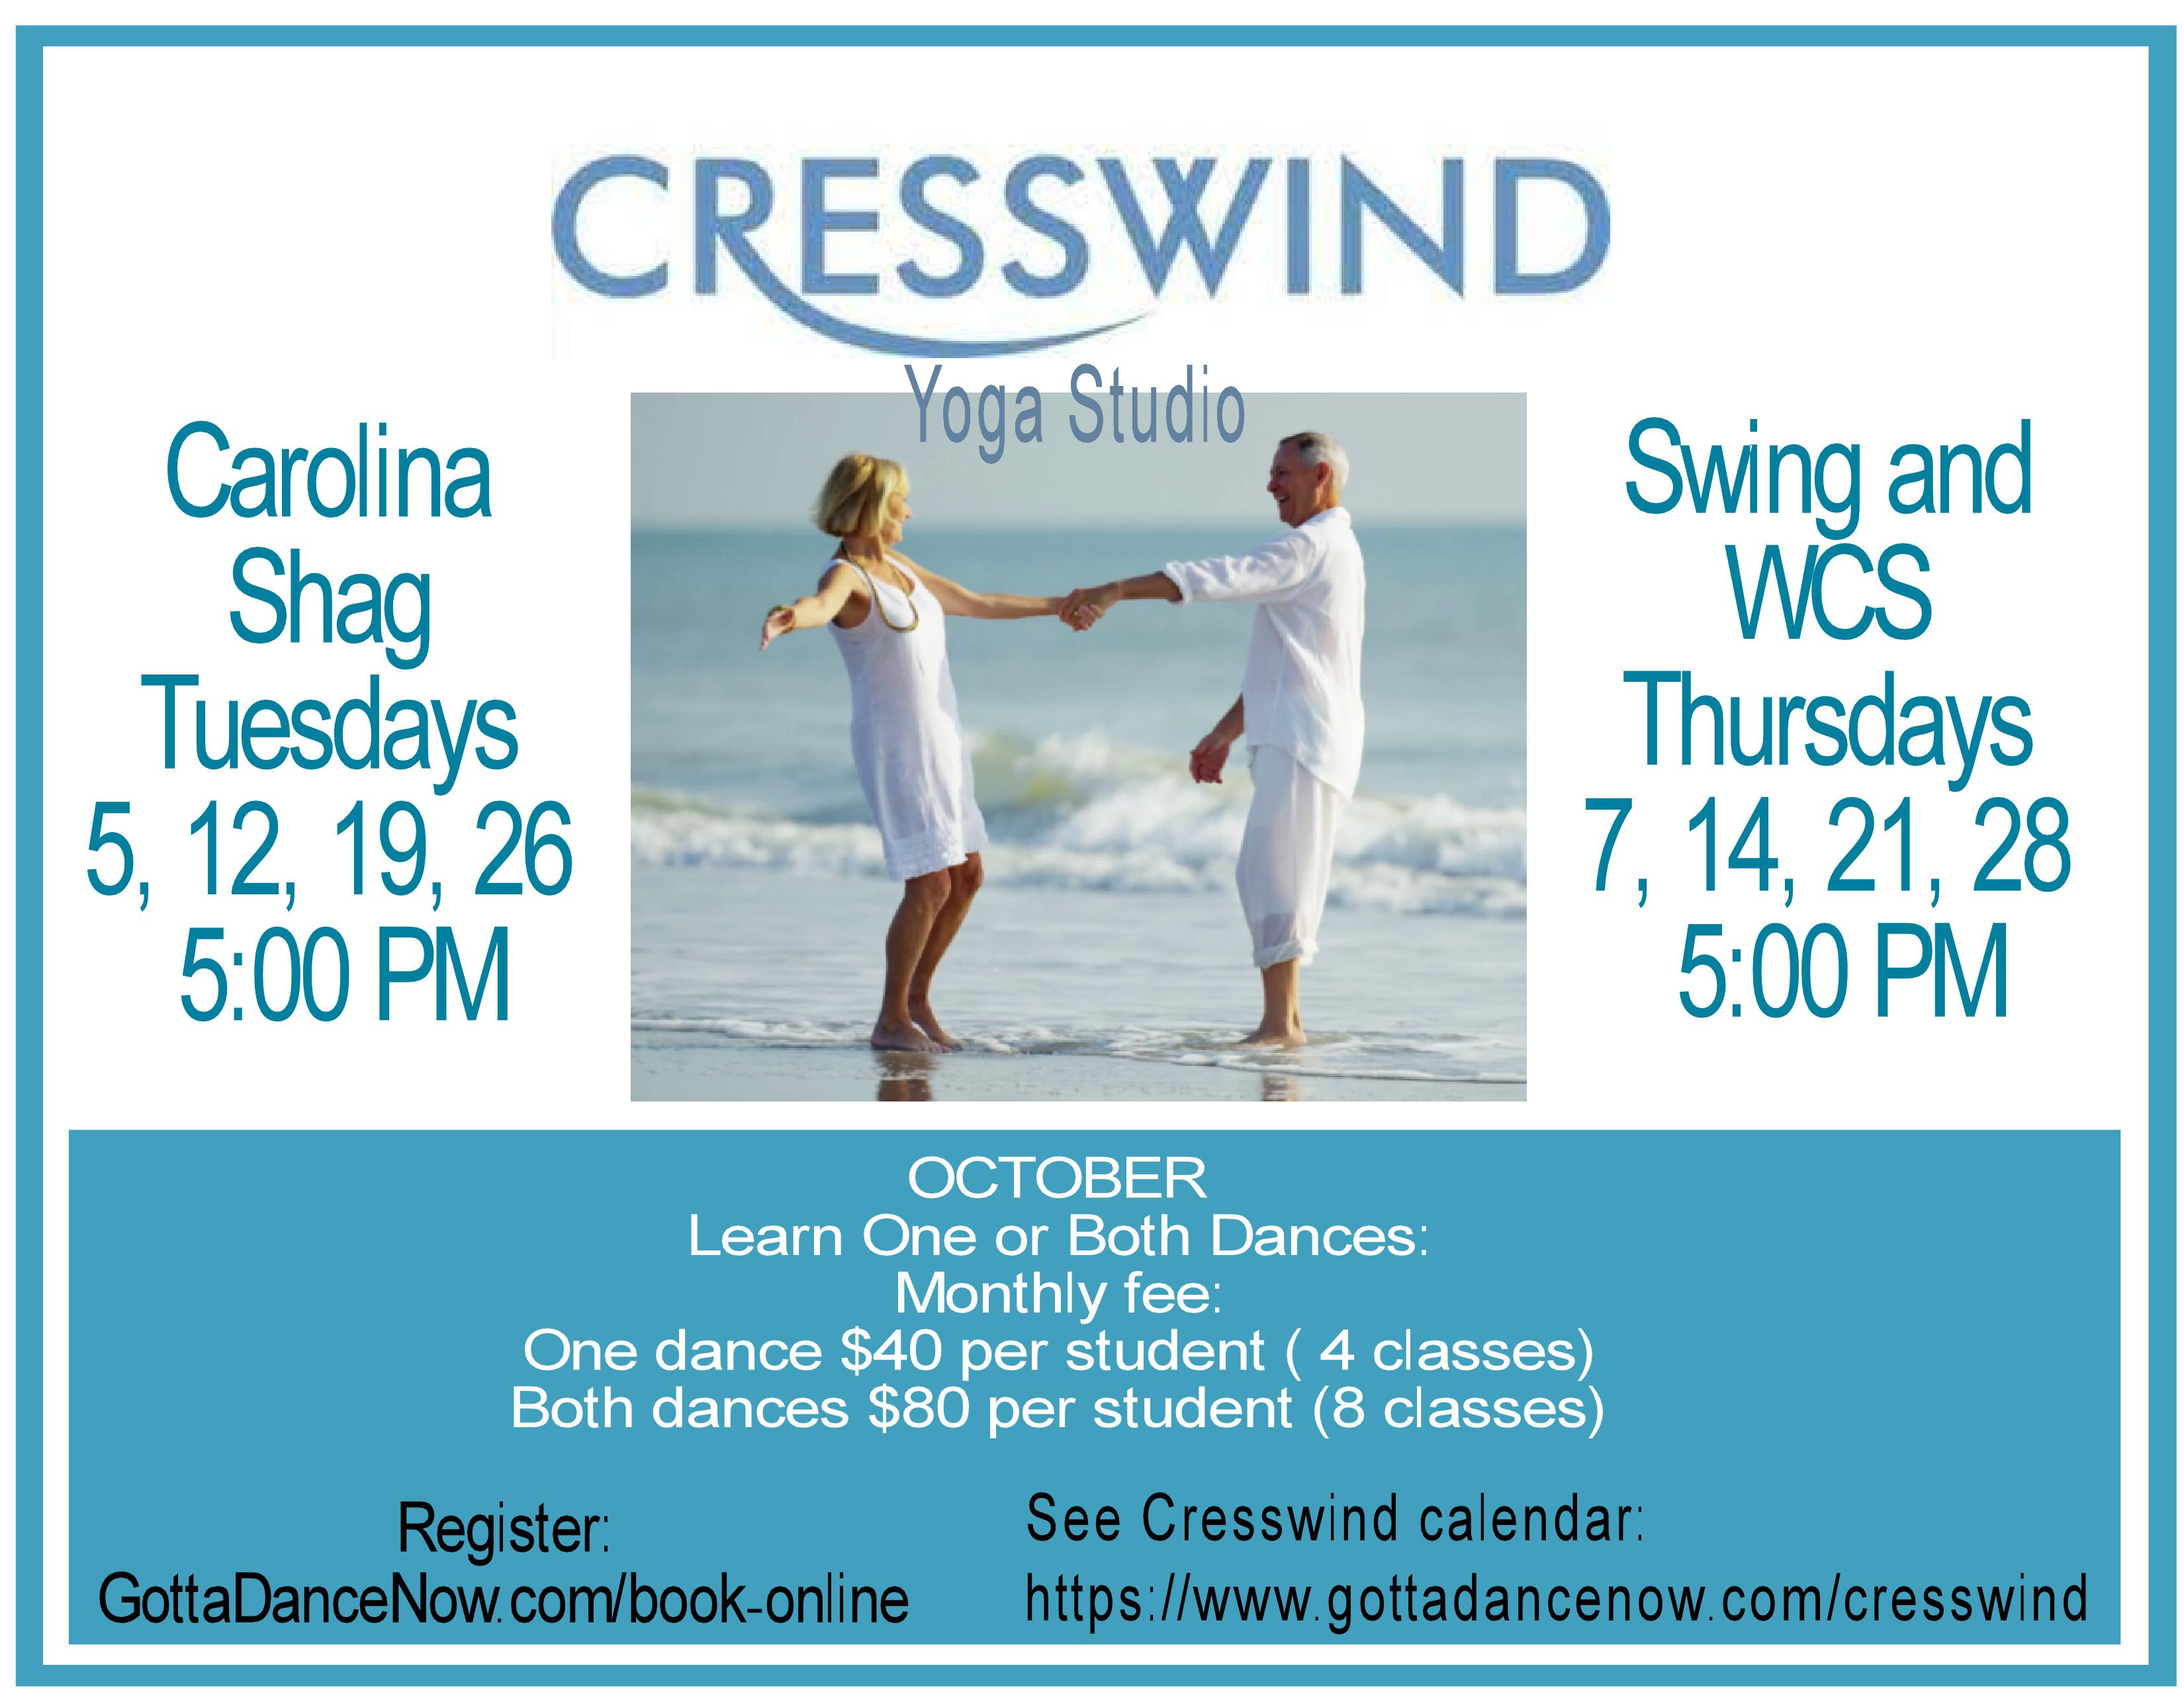 Cresswind Classes